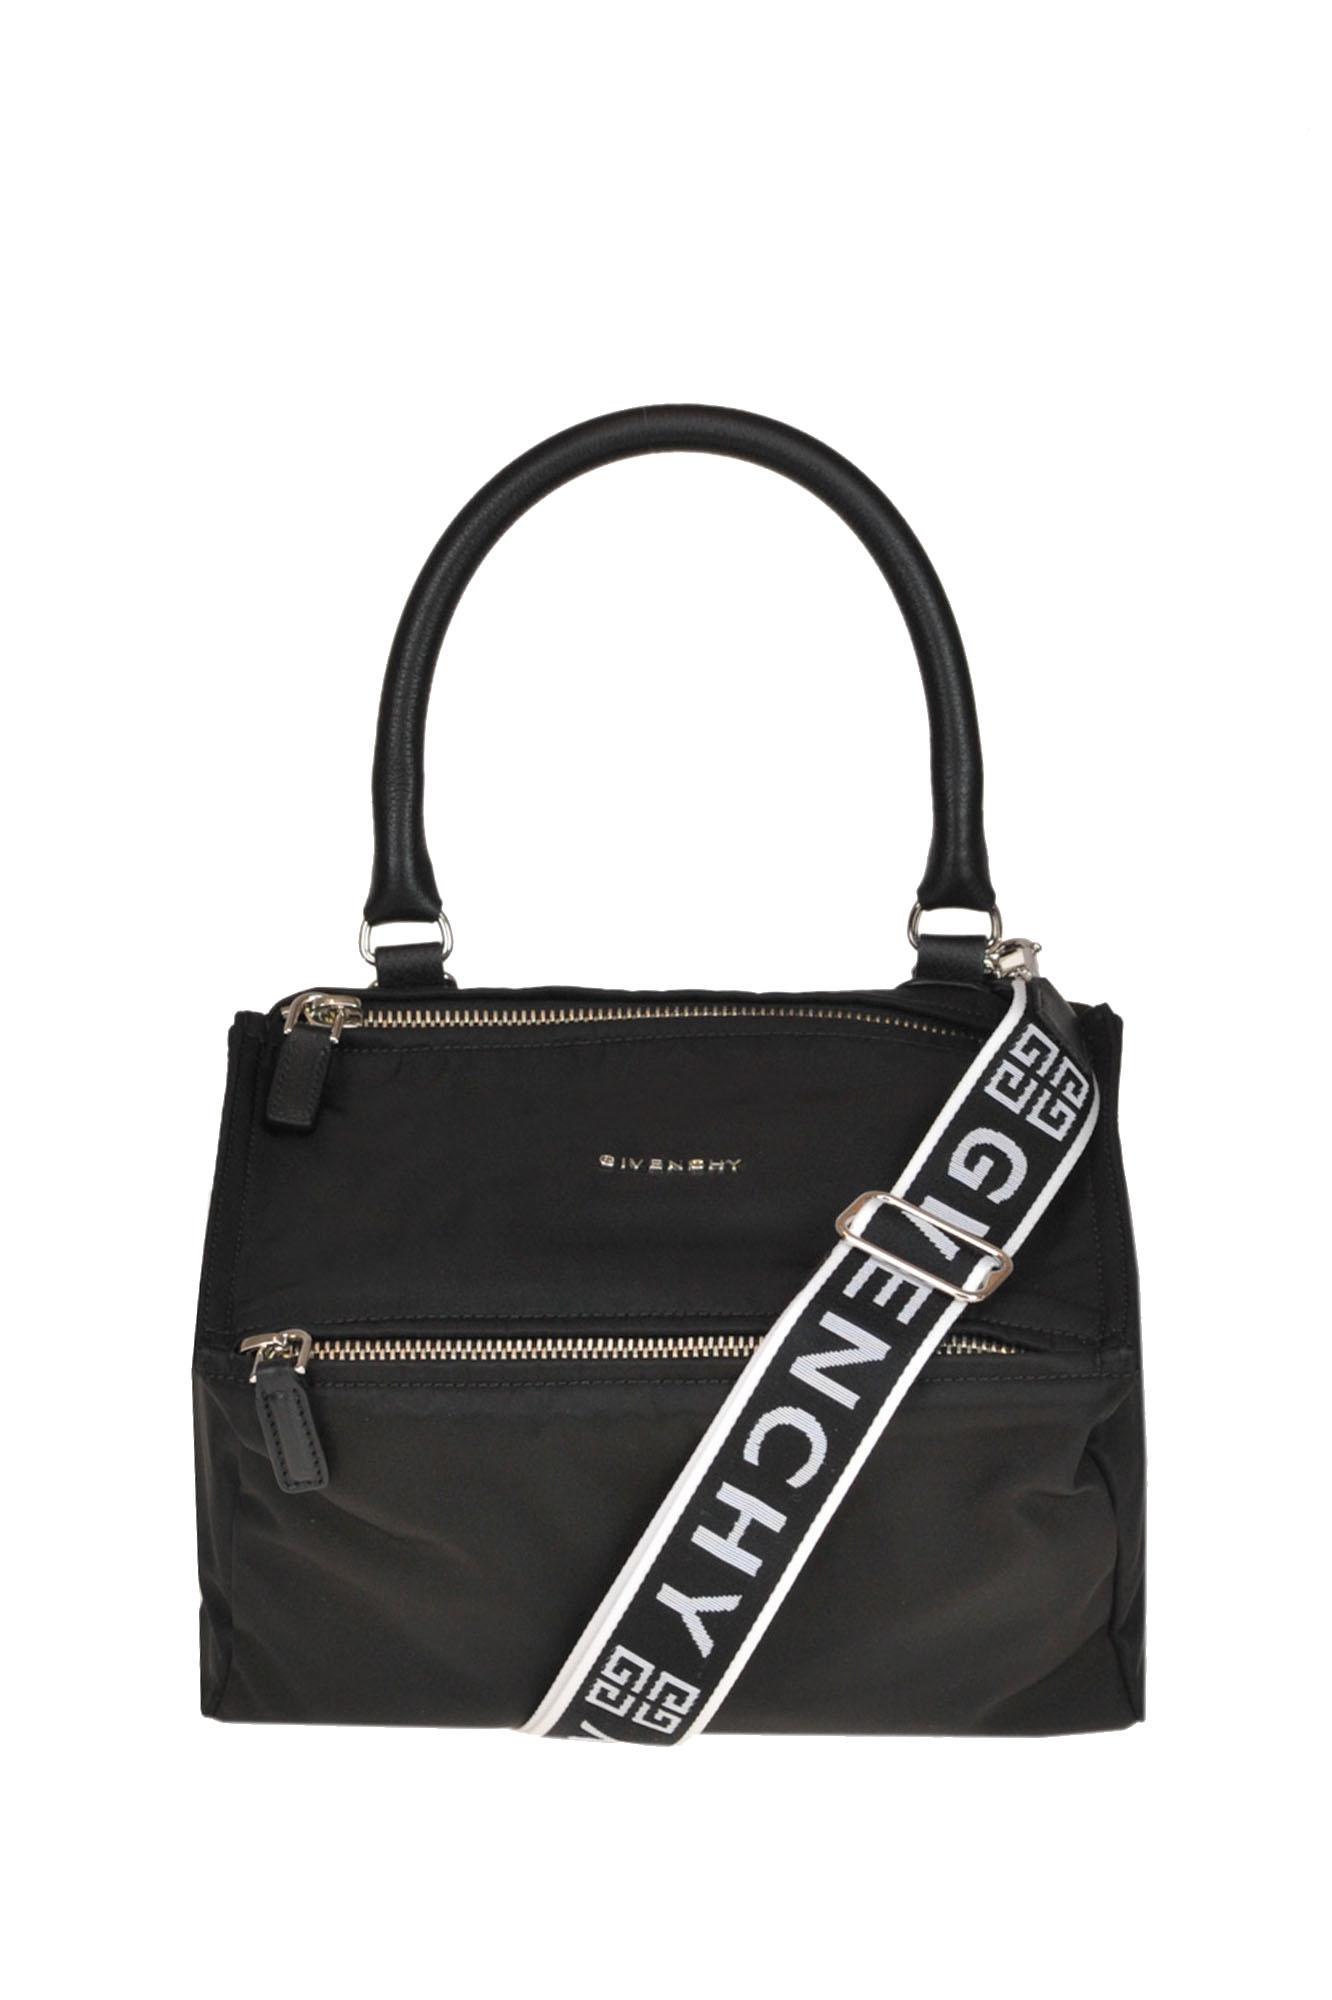 952c75c4f67 Givenchy 'Pandora Small' Nylon Bag In Black | ModeSens